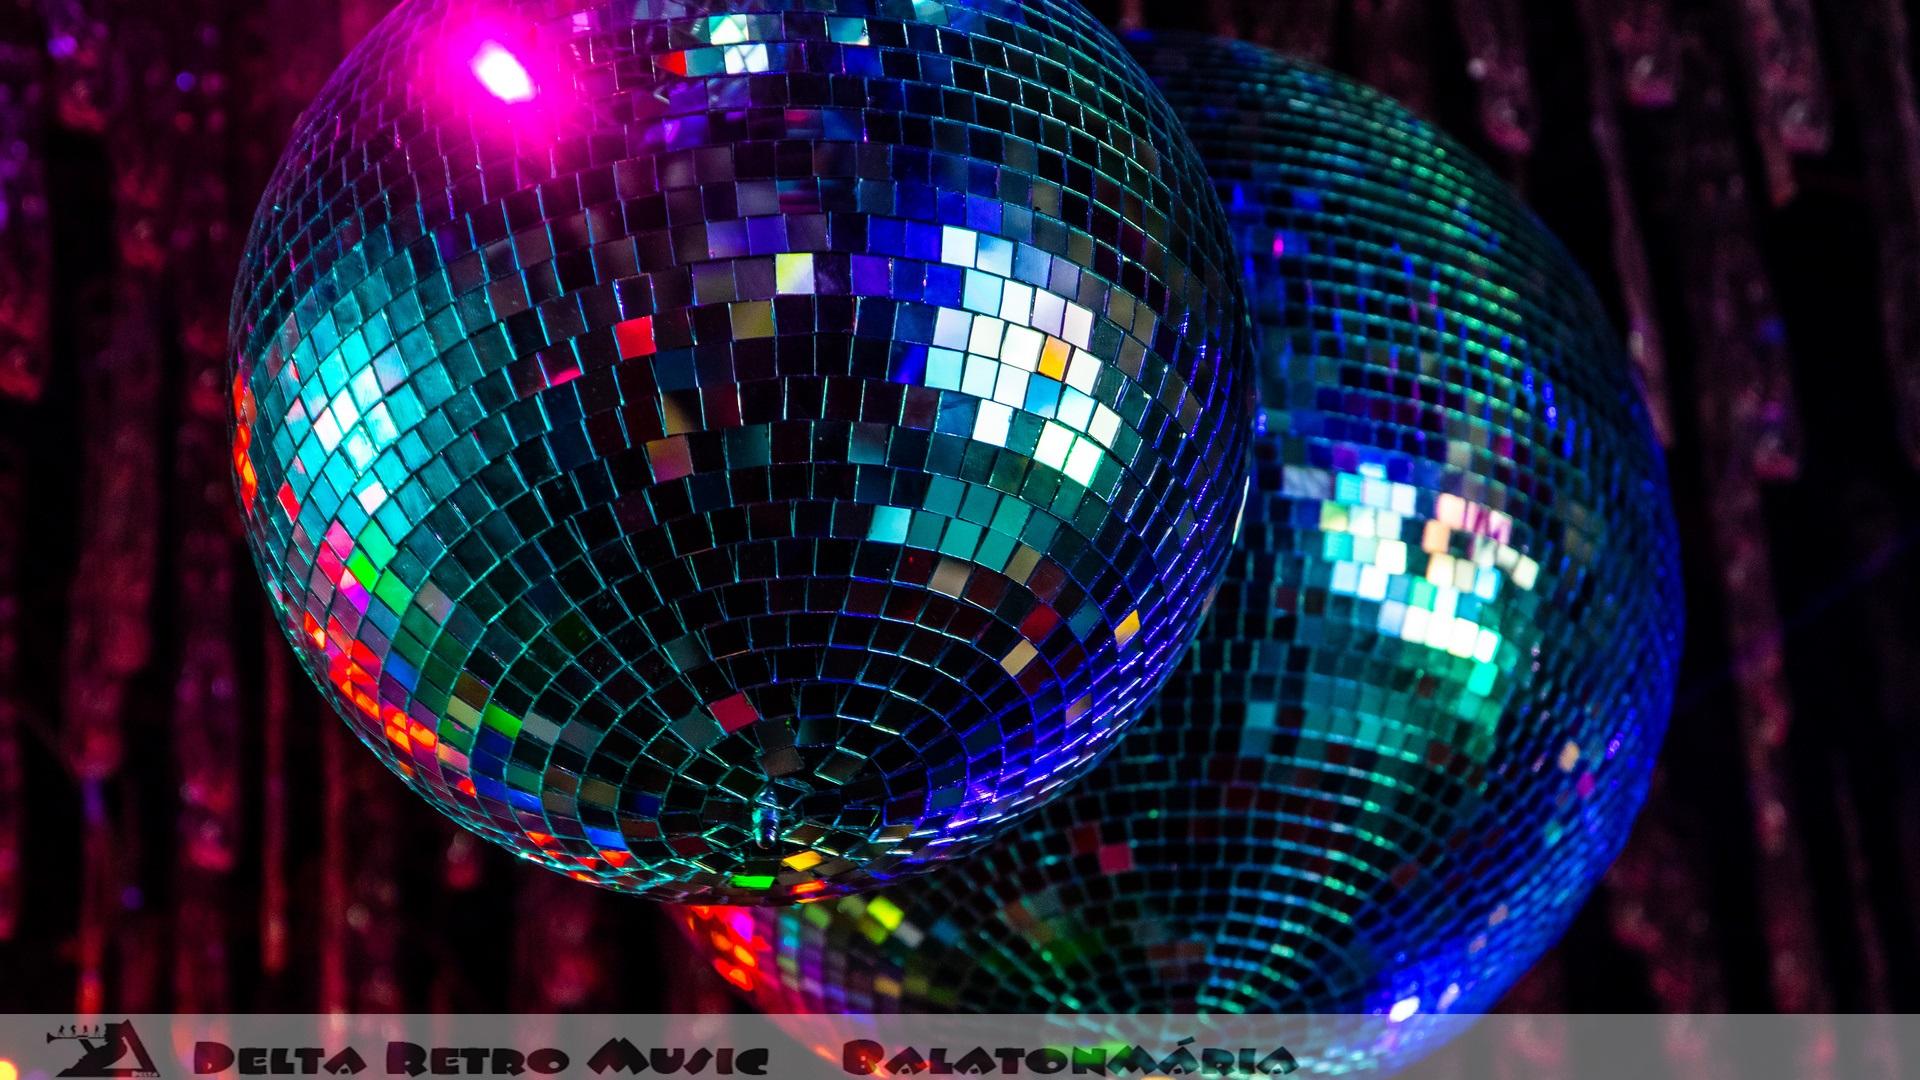 luxfunk-radio-funky-party_200807_delta retro-music-factory_082